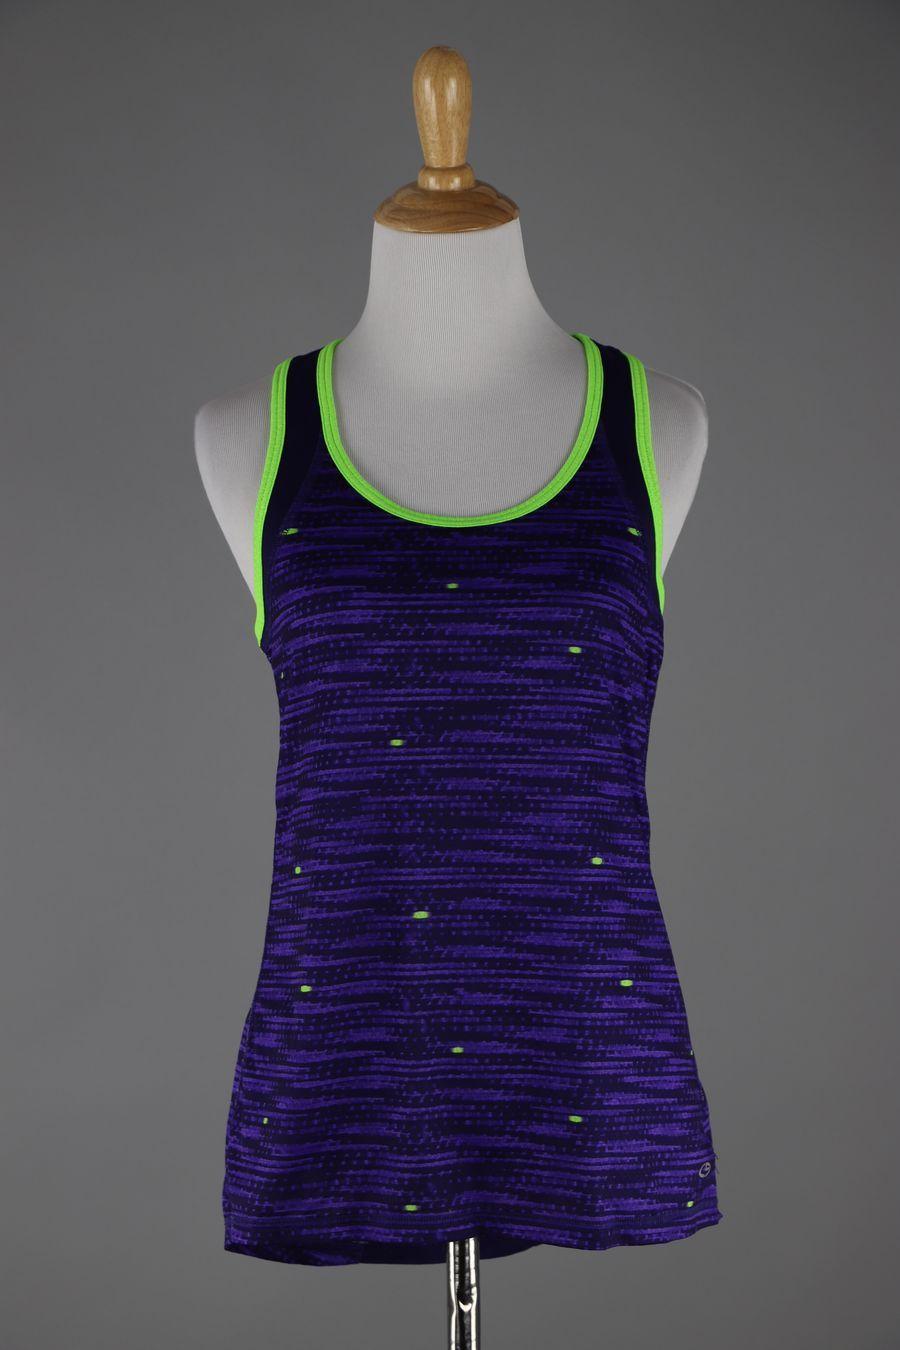 Champion duodry purple racer back active wear top size s goodtwice